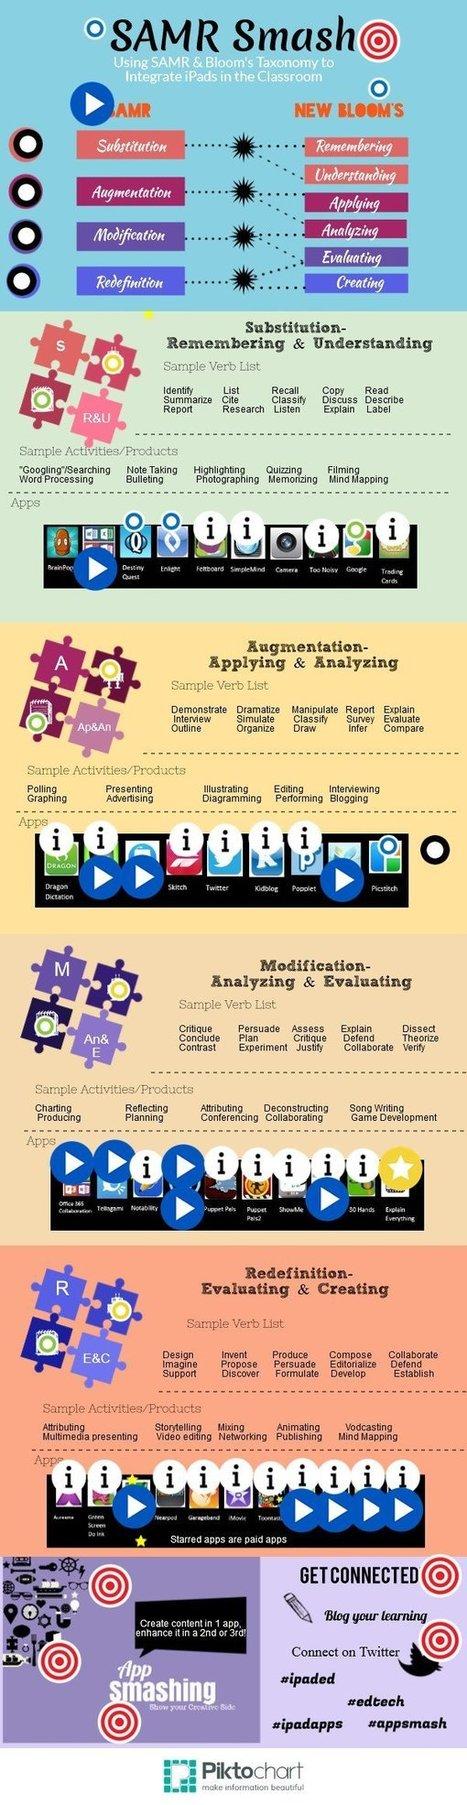 SAMR Smash by hneltner | iPad Apps for Learning | Scoop.it